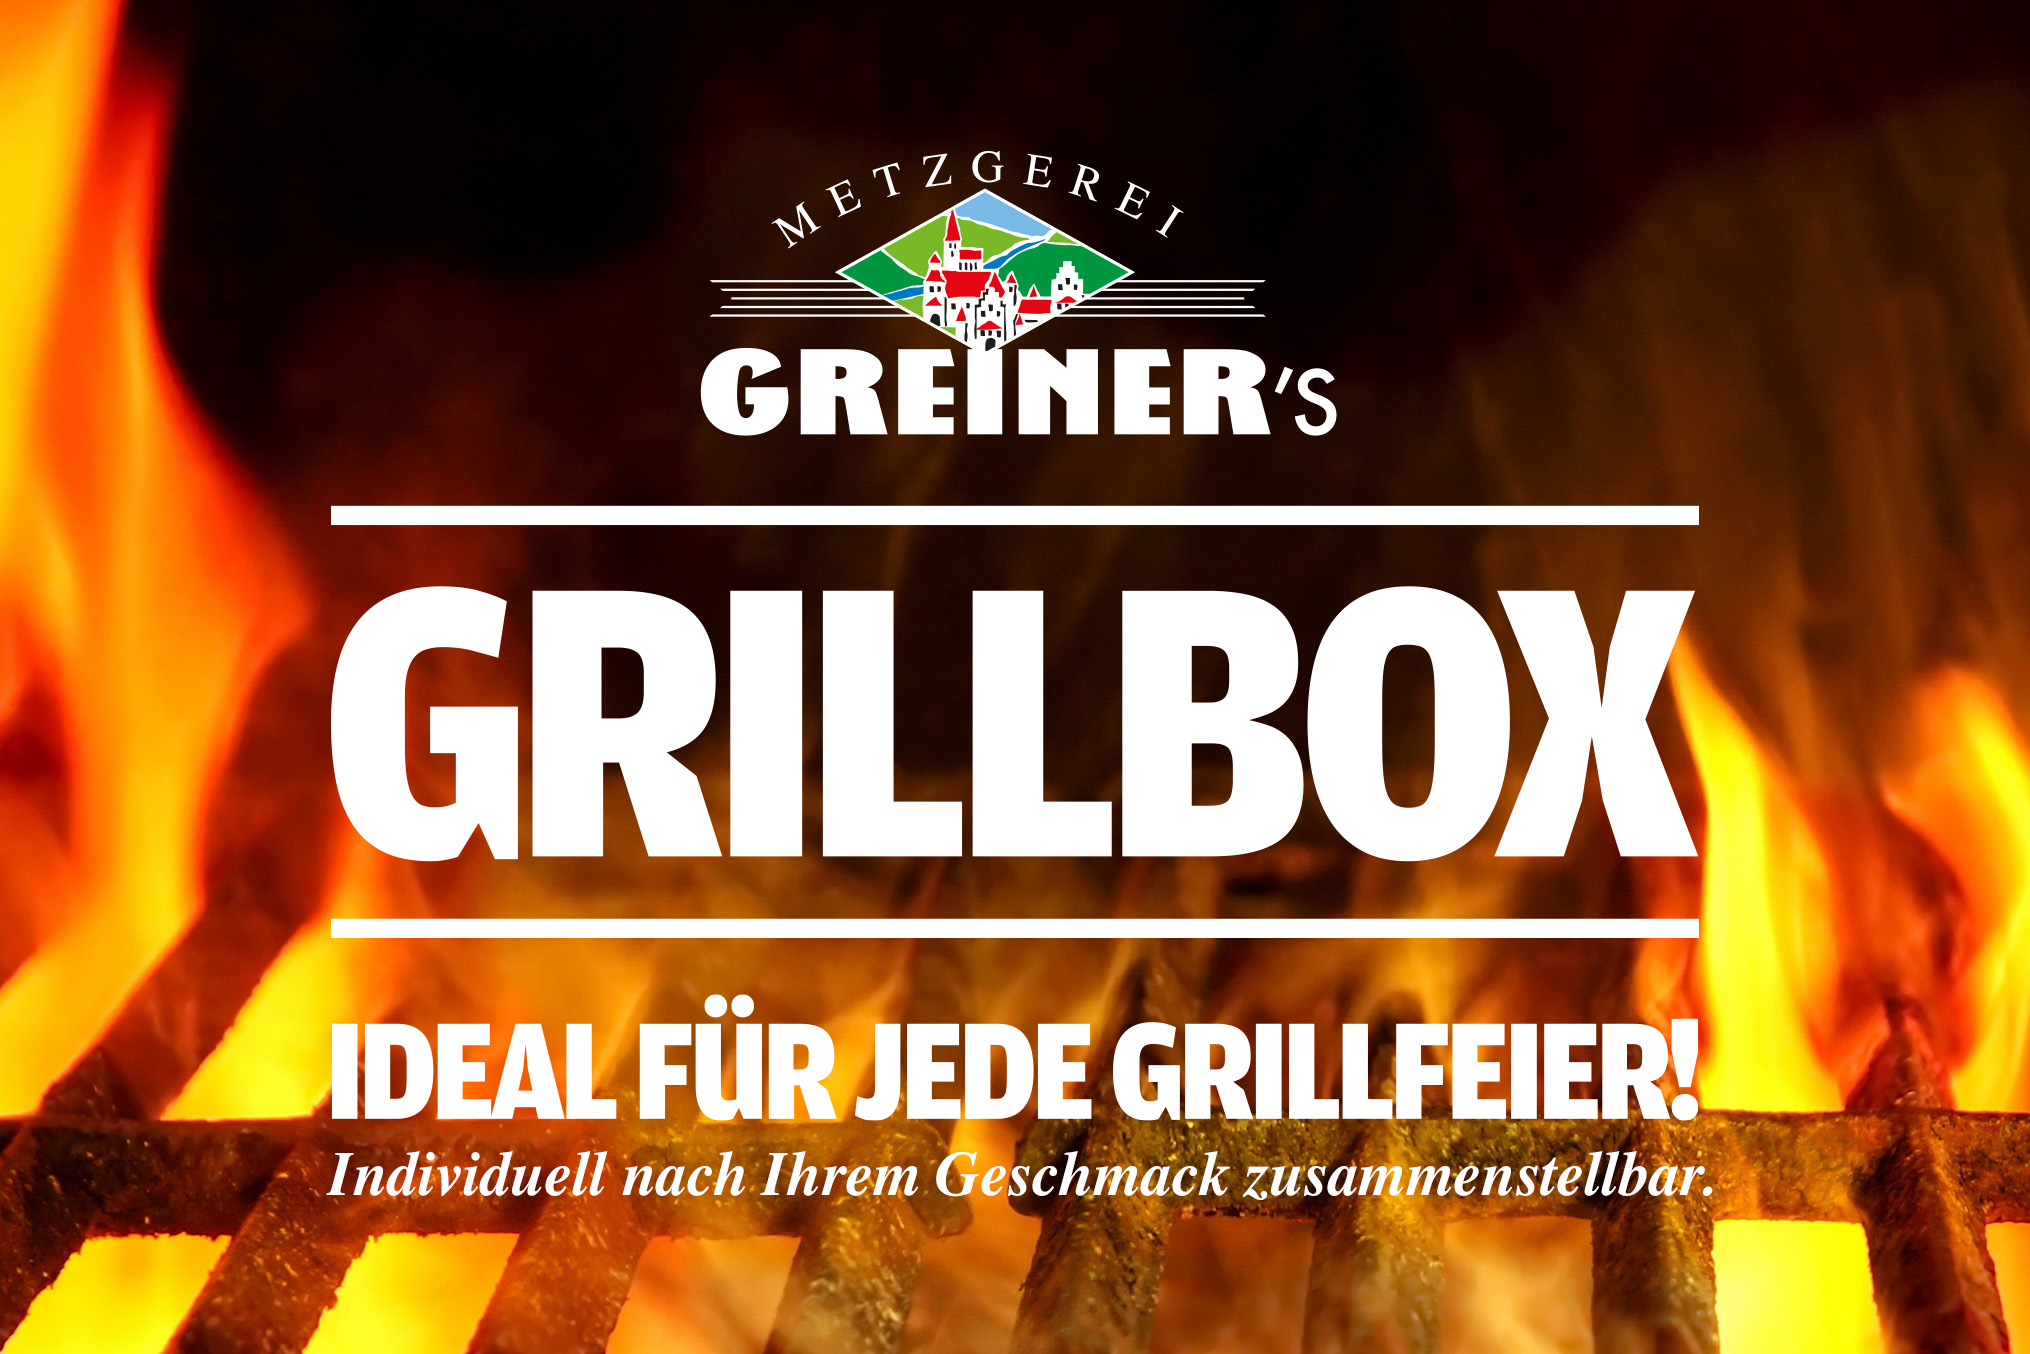 Greiner_Grillbox_Kasse